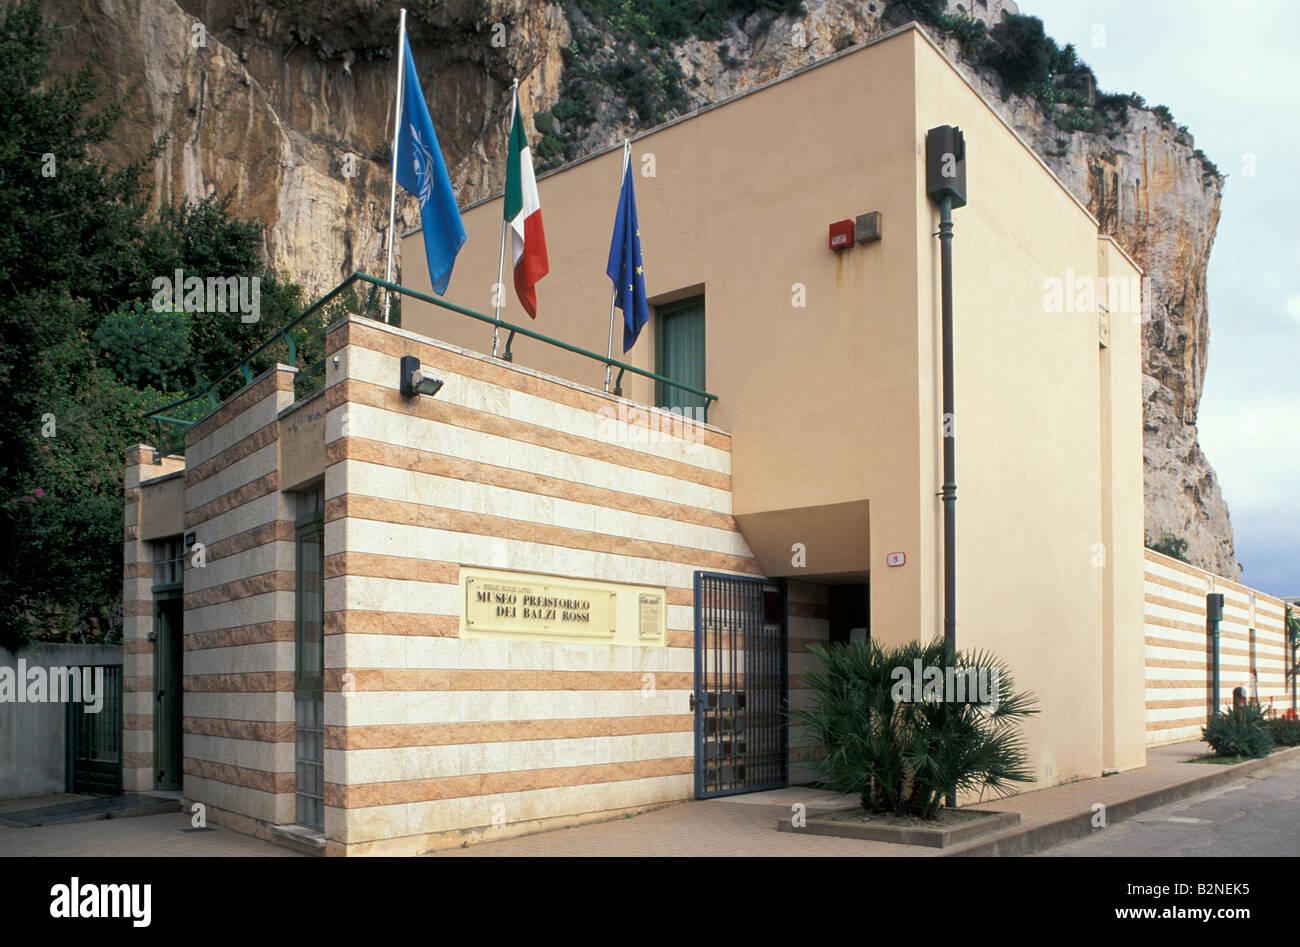 prehistory museum of balzi rossi, ventimiglia, italy - Stock Image